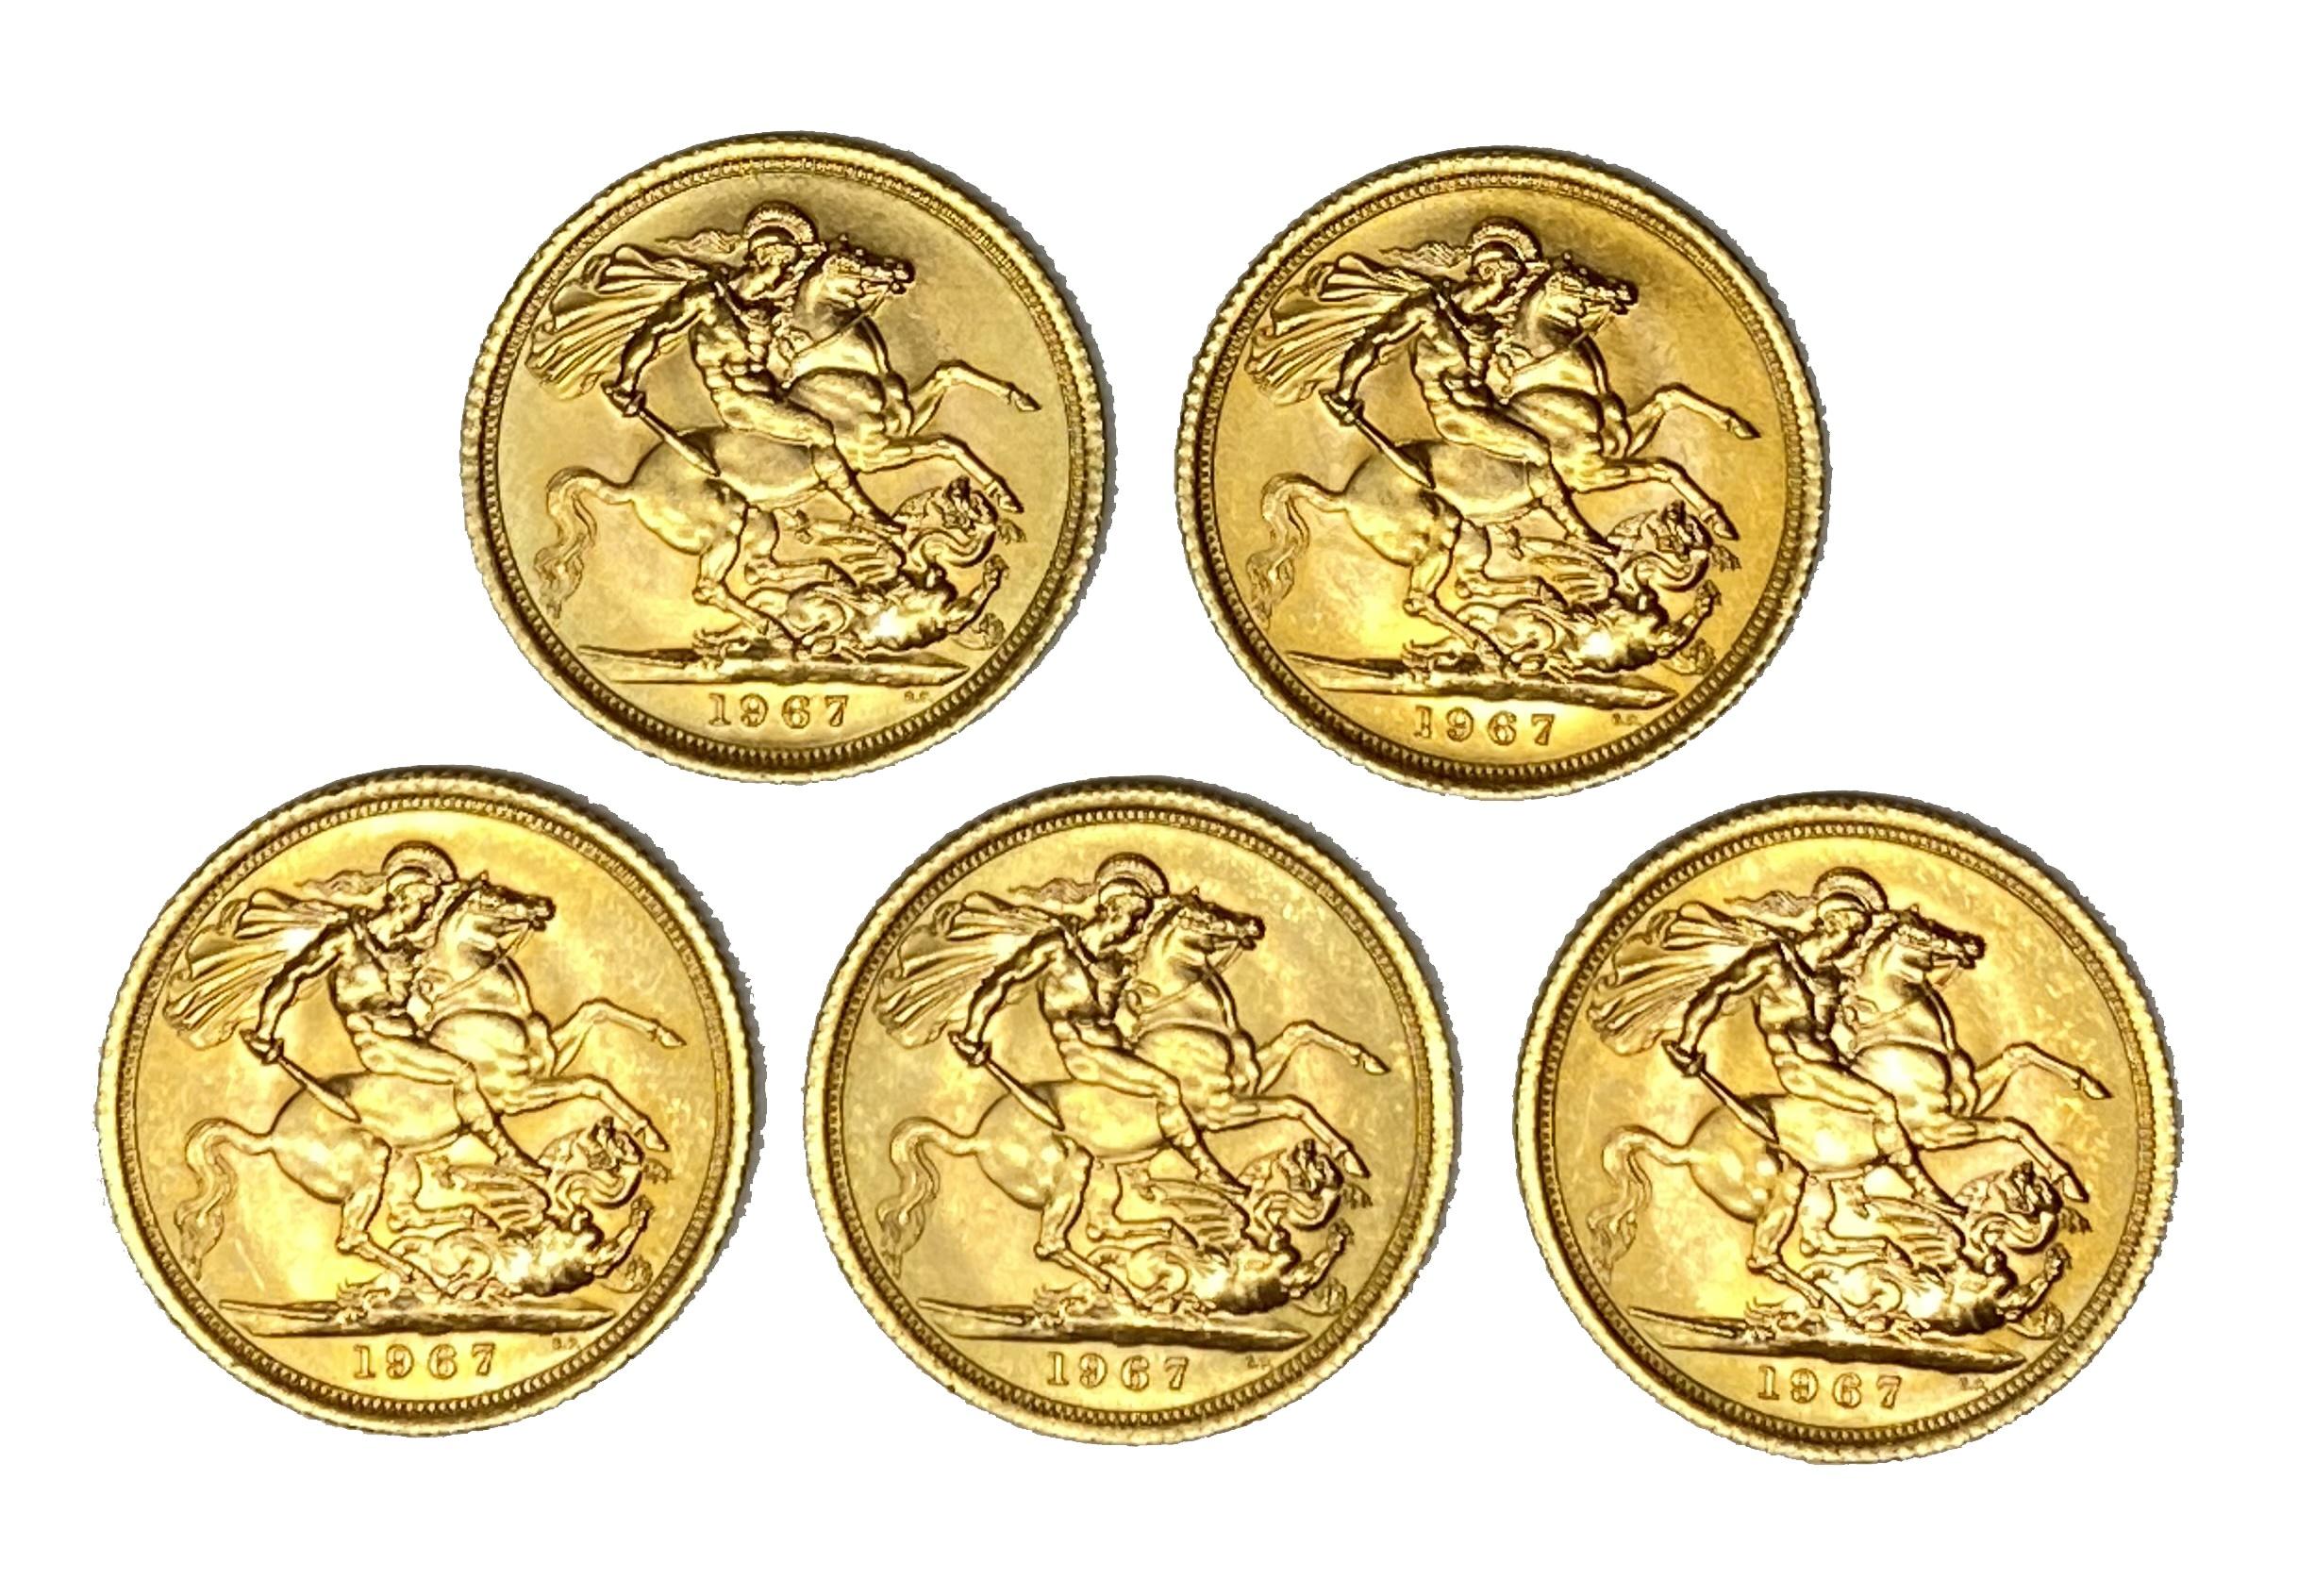 Elizabeth II five gold Sovereign coins, 1967 - Image 2 of 2